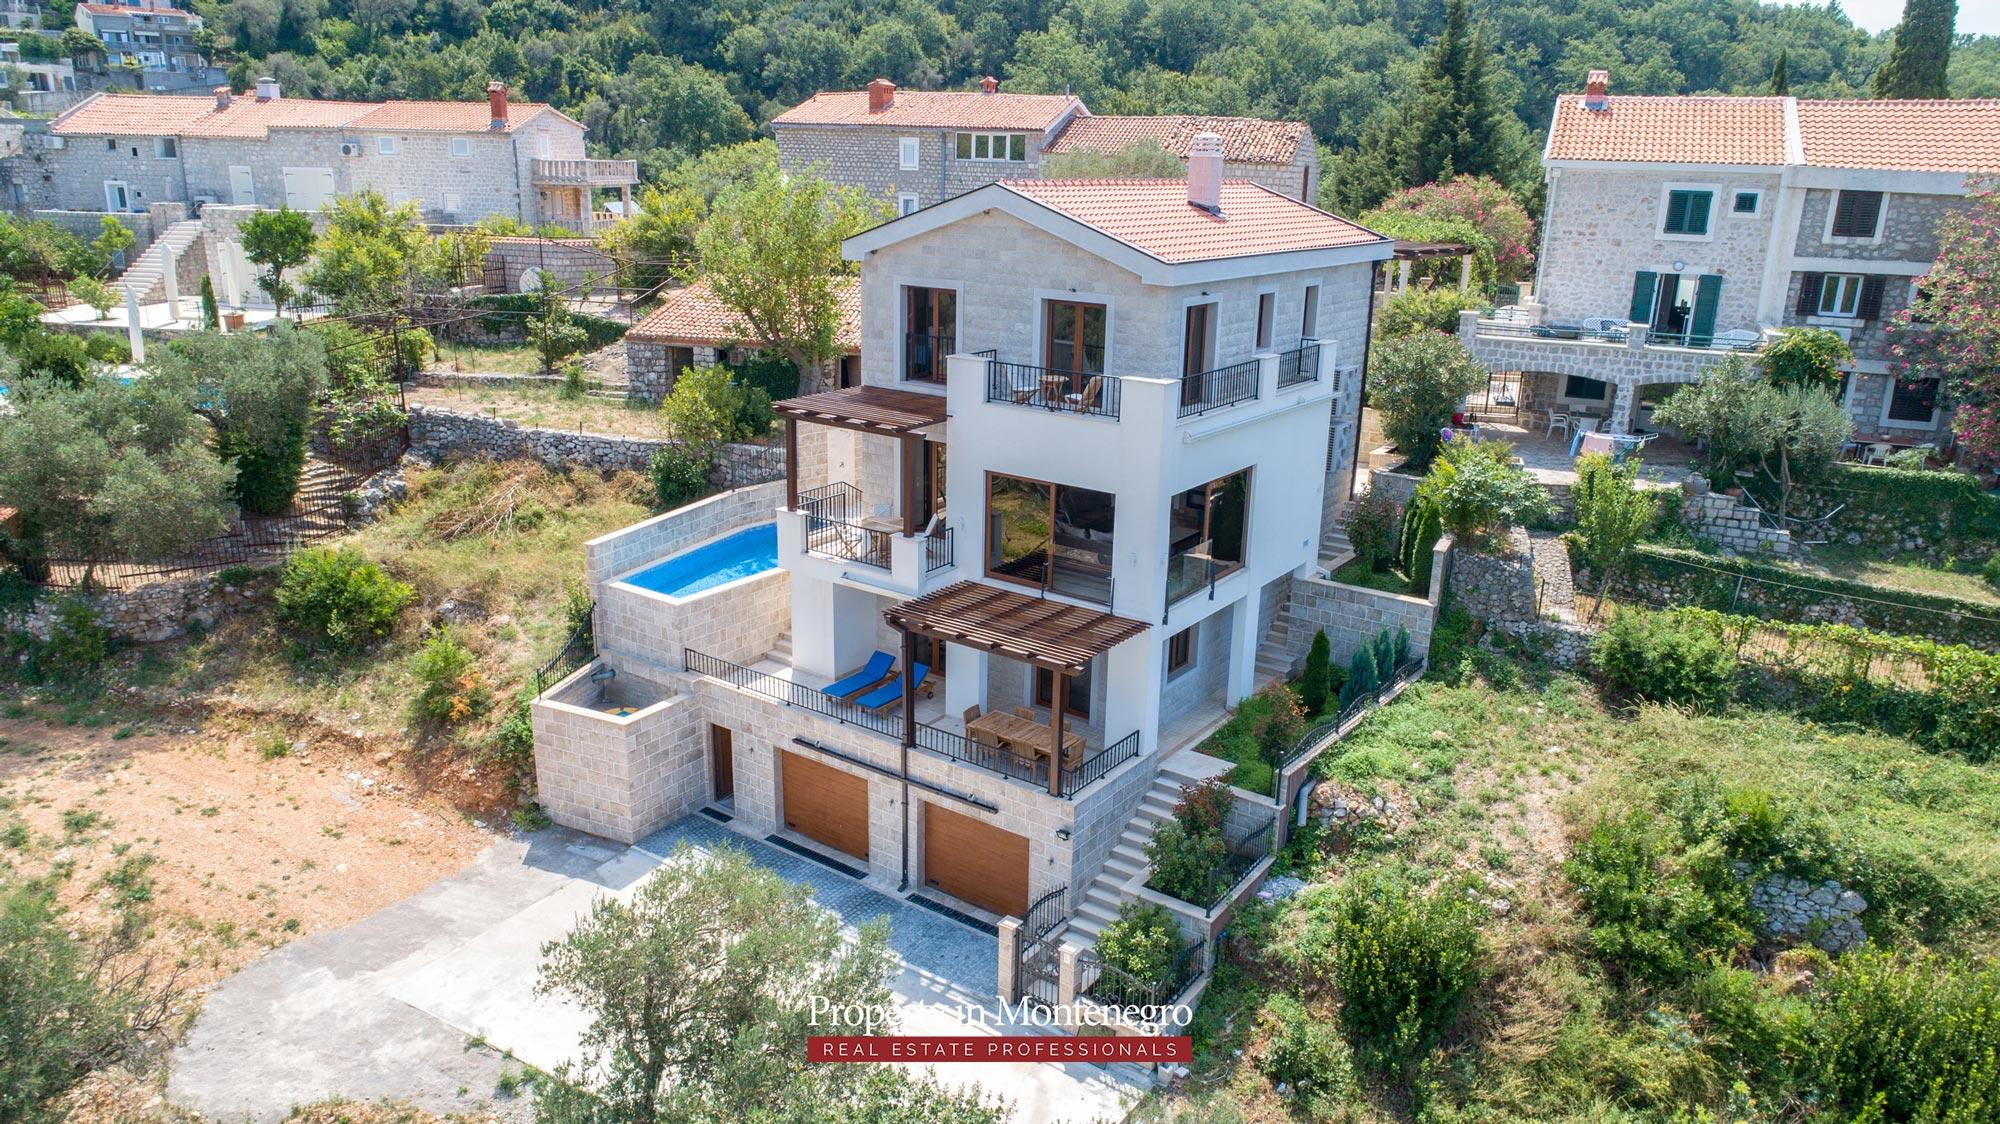 luxury-villa-with-swimming-pool-for-sale-in-Budva (29).jpg